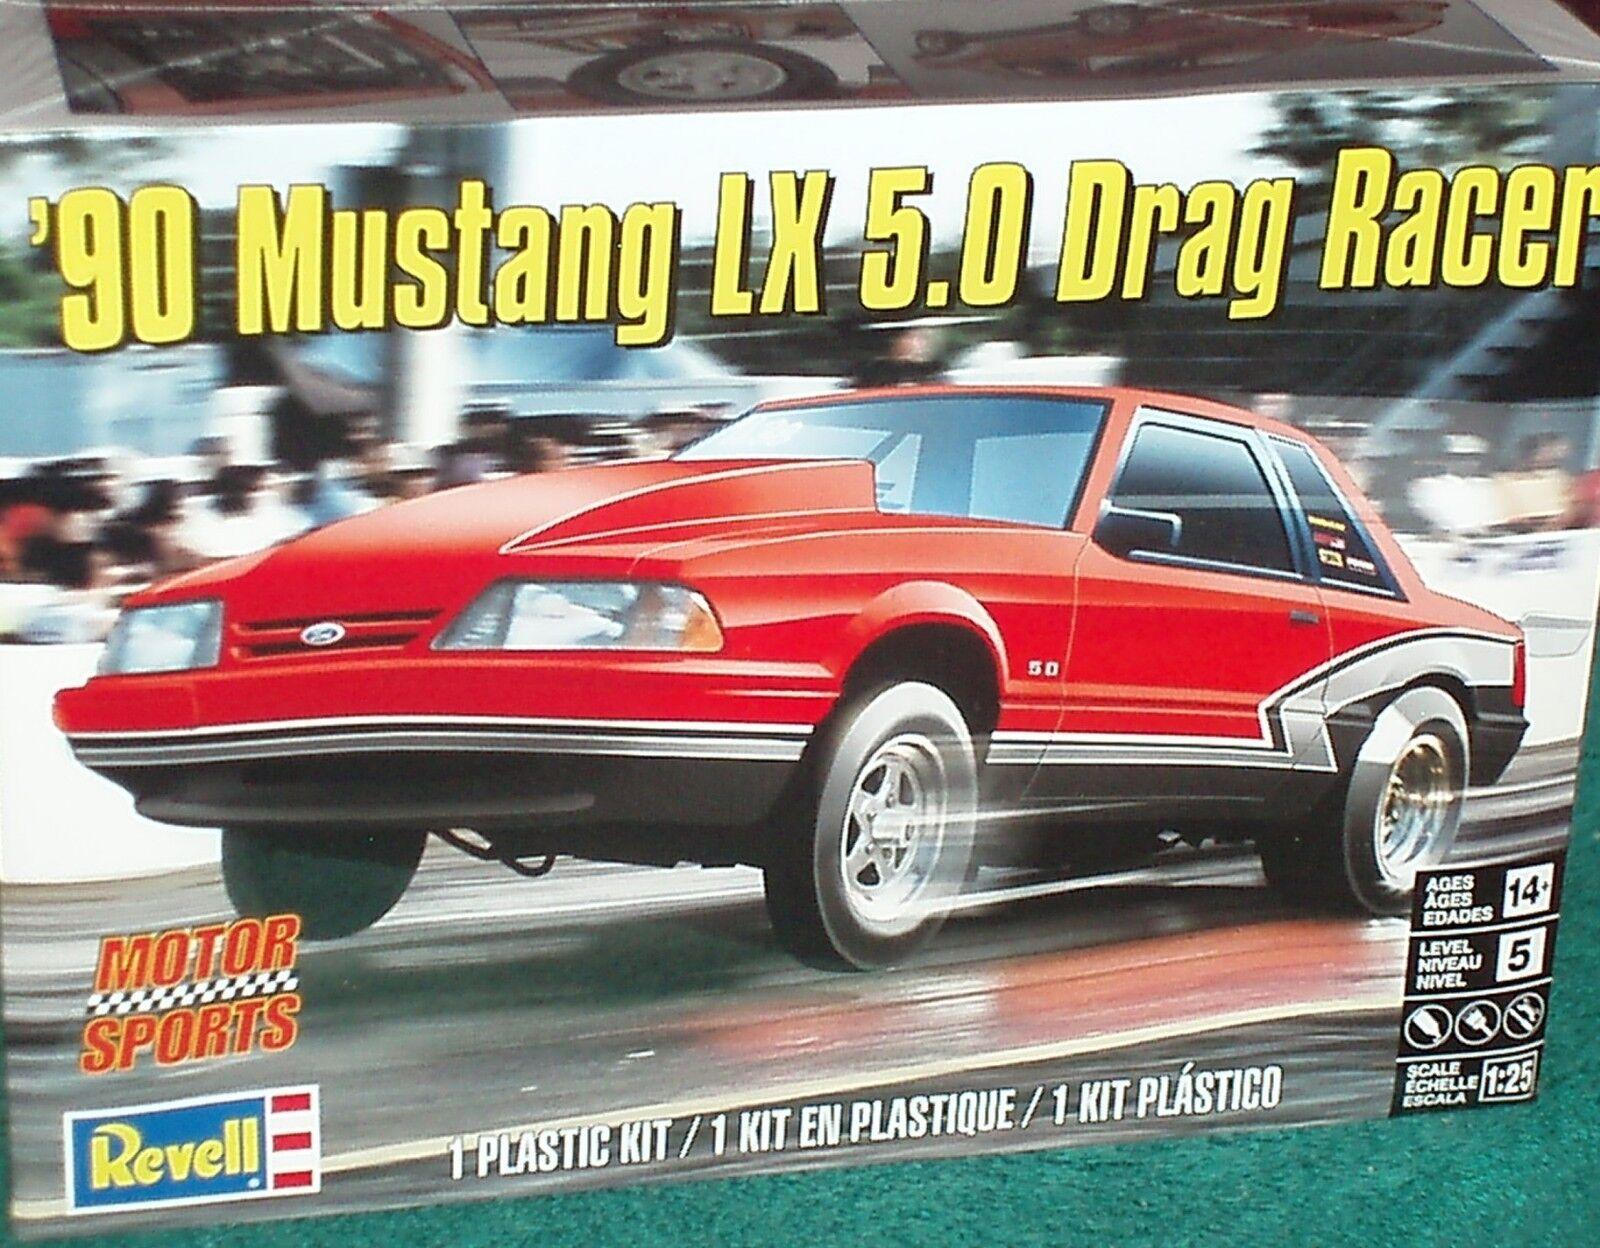 REVEL 1990 FORD MUSTANG 5.0 1  25 PLASTIC modellllerL SEALD SKILL 5 PRO STREET